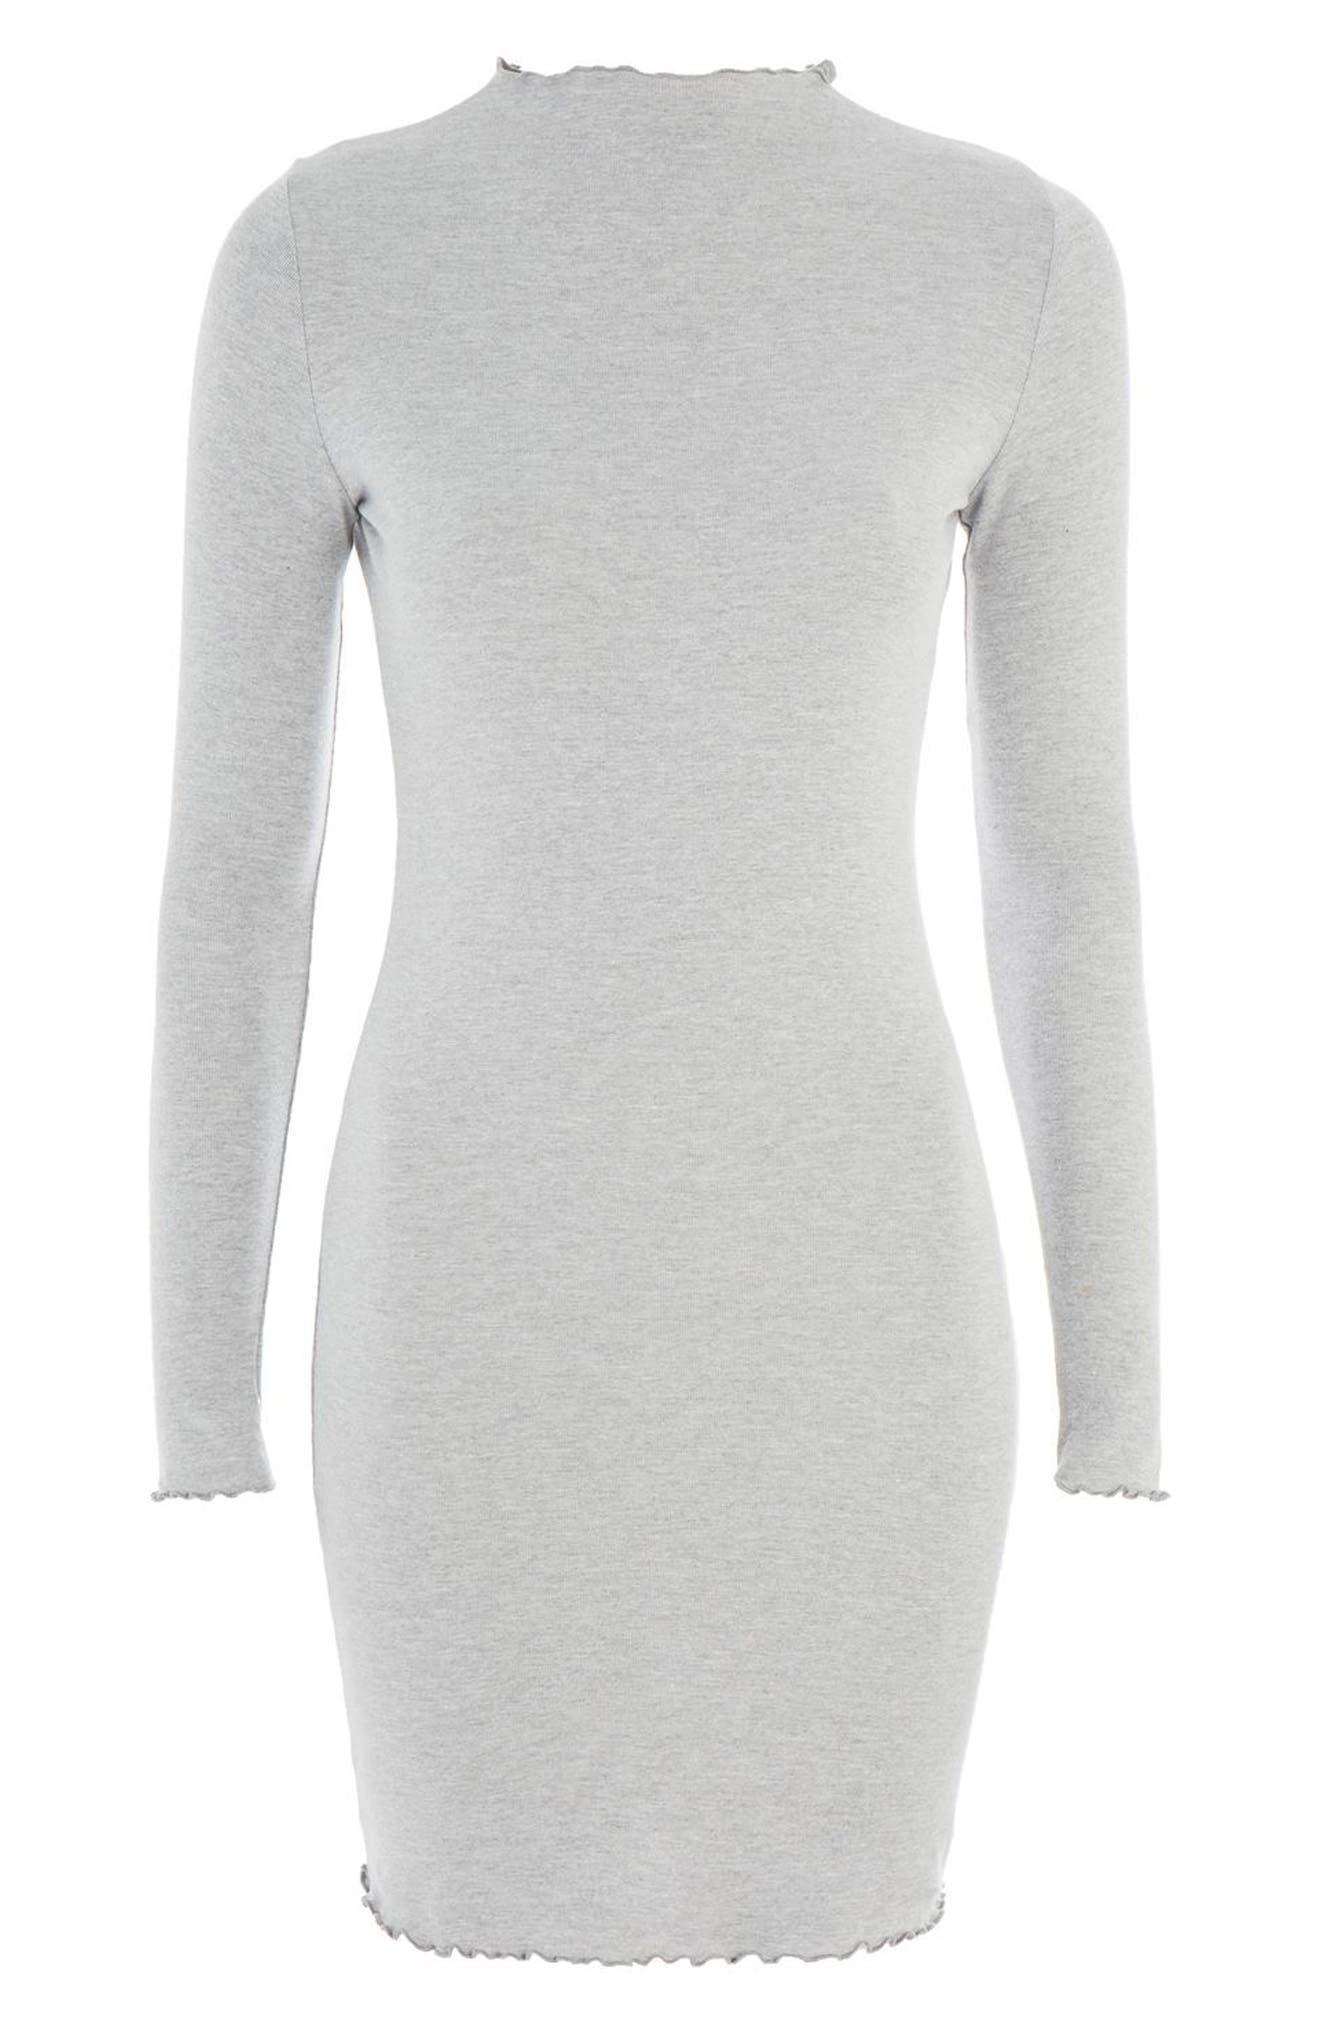 Lettuce Edge Body-Con Dress,                             Alternate thumbnail 3, color,                             Grey